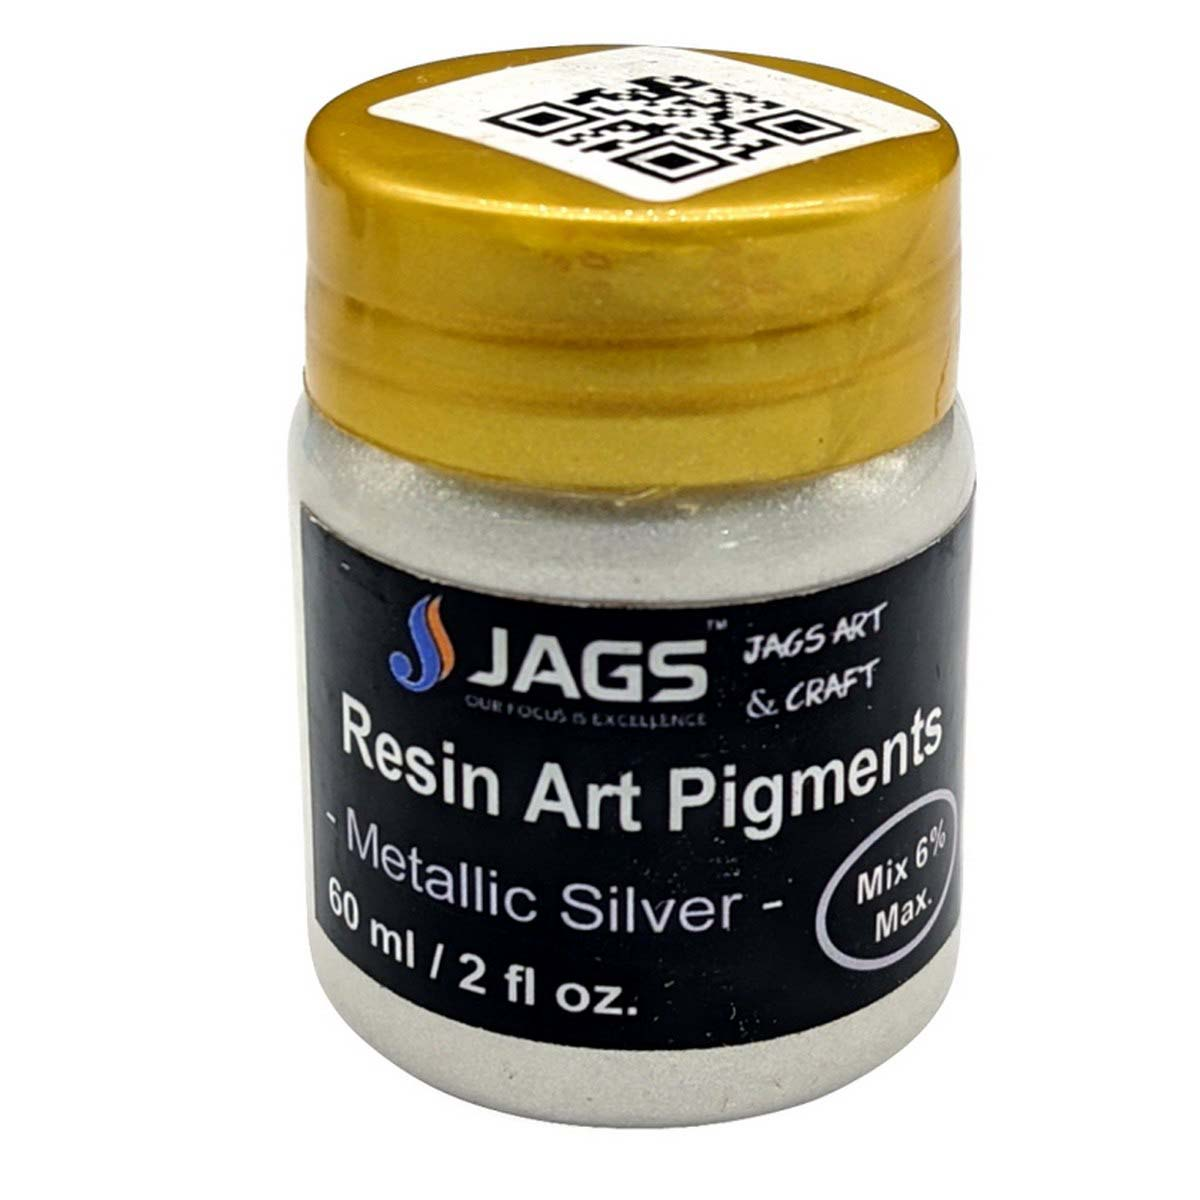 Resin Art Pigments Metallic Silver